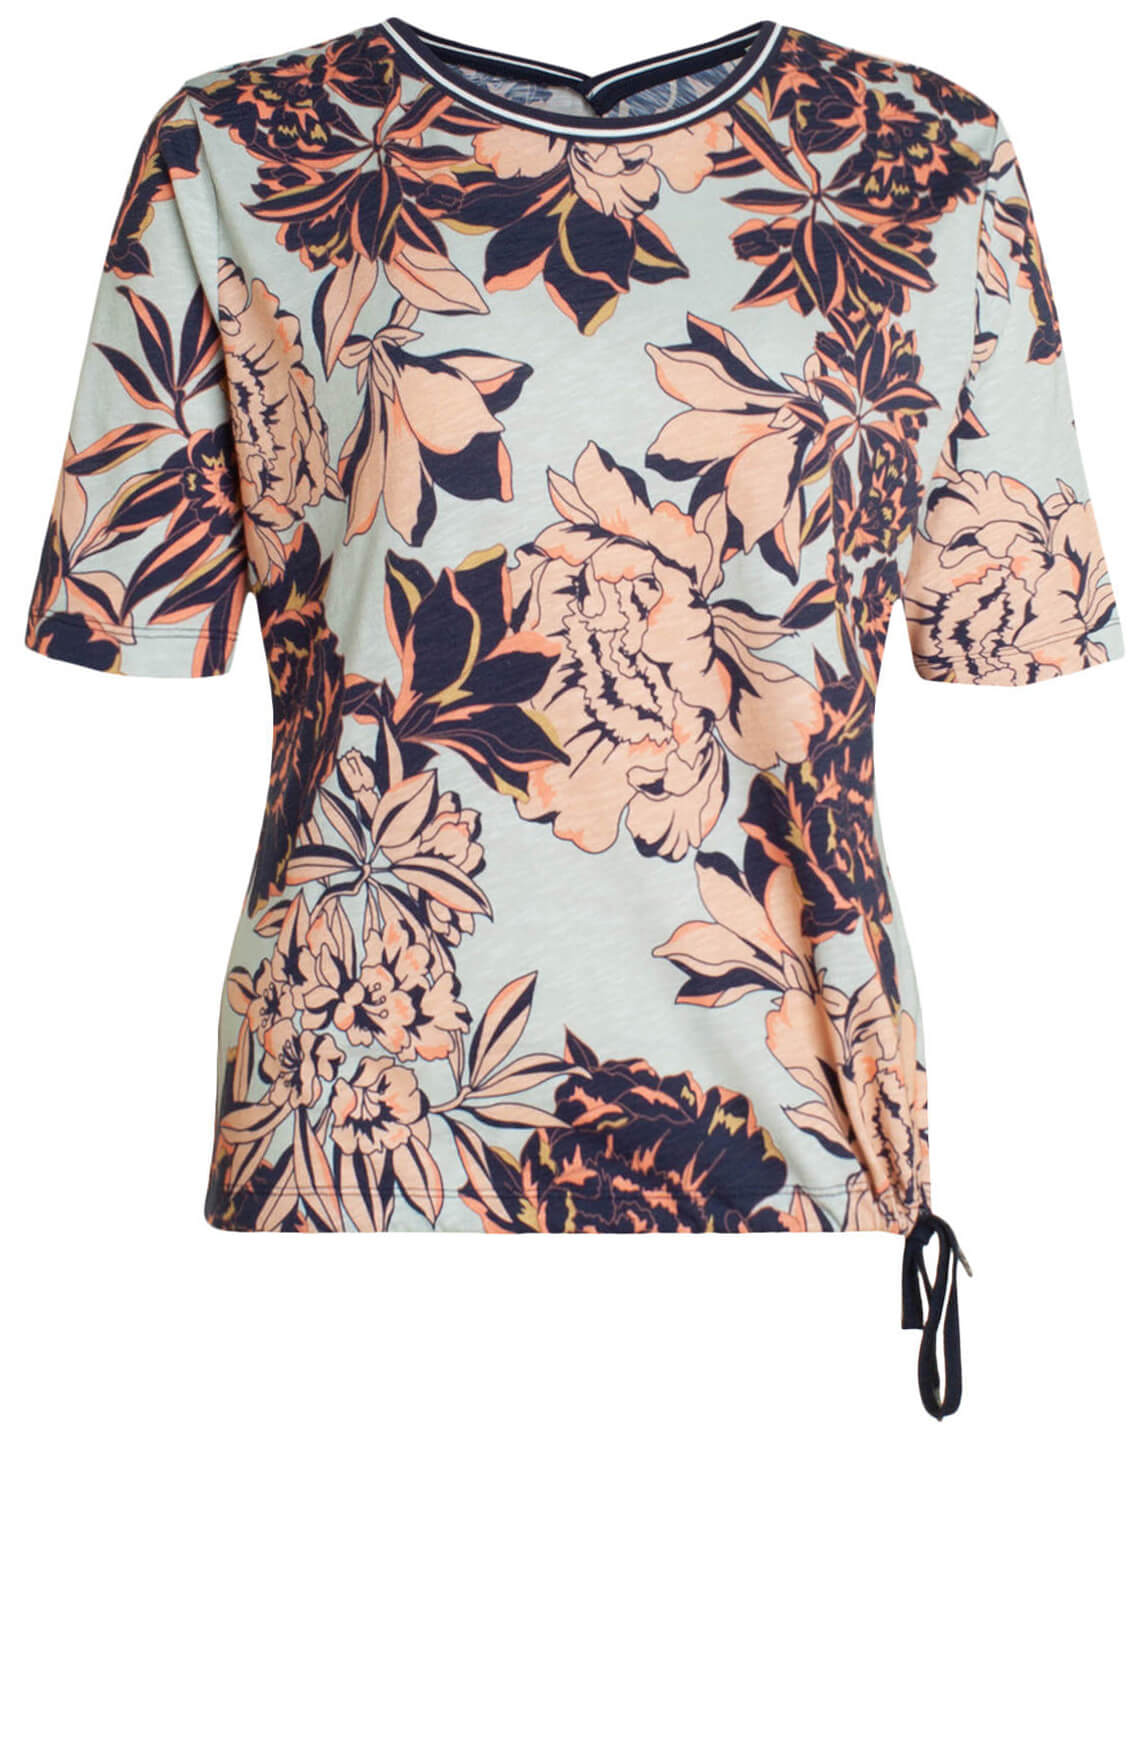 Anna Blue Dames Shirt met floral print Blauw